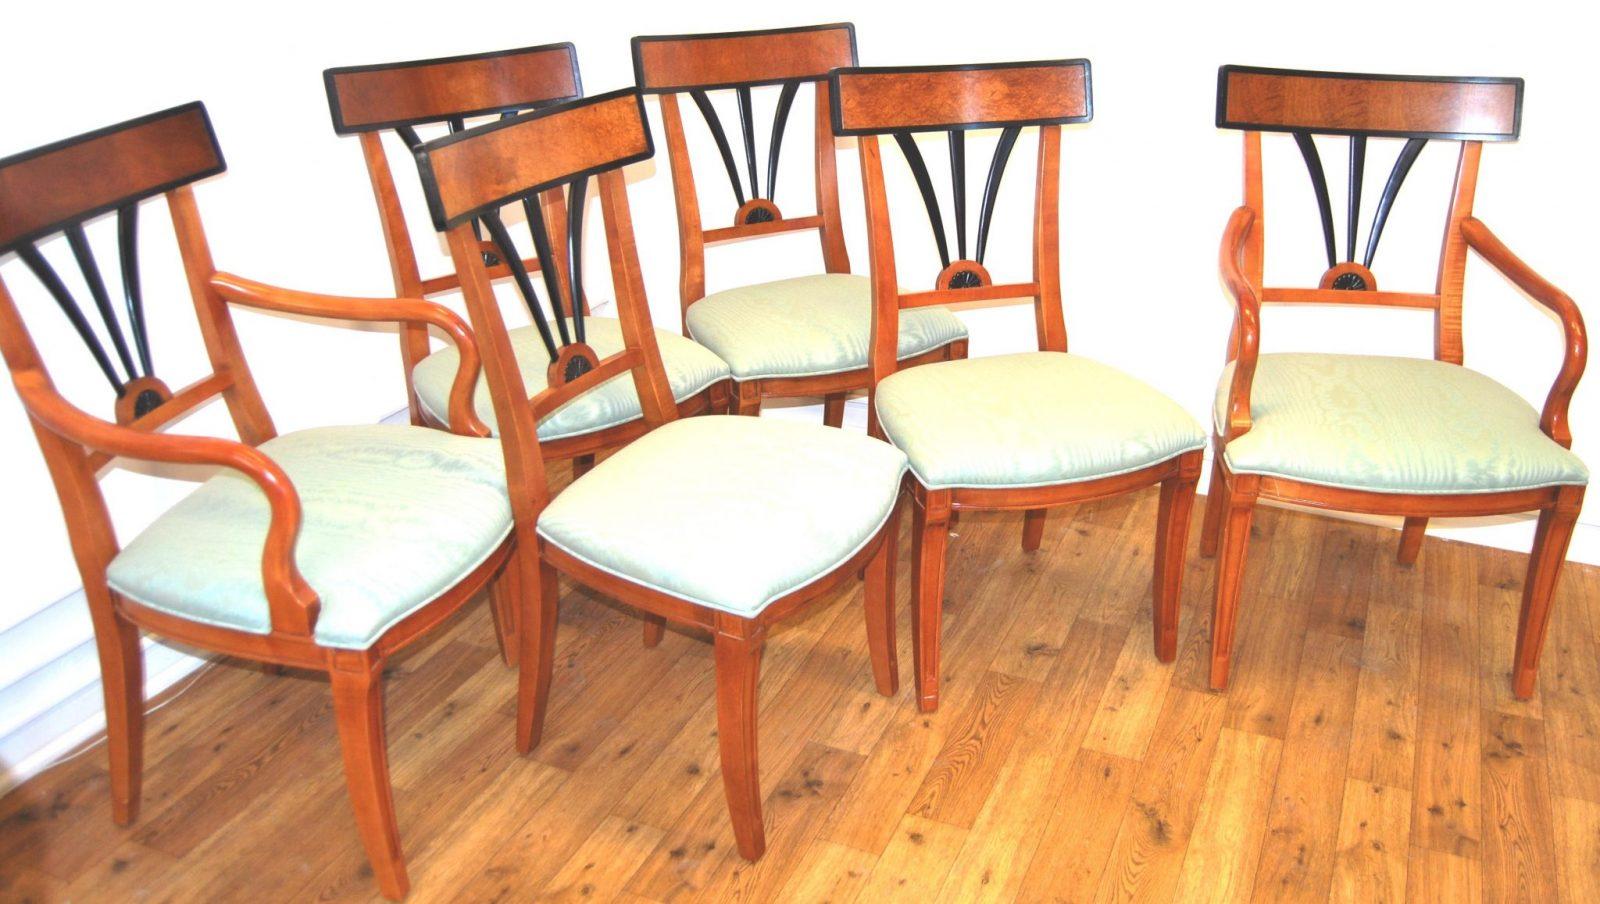 Mary Kayu0027s Furniture